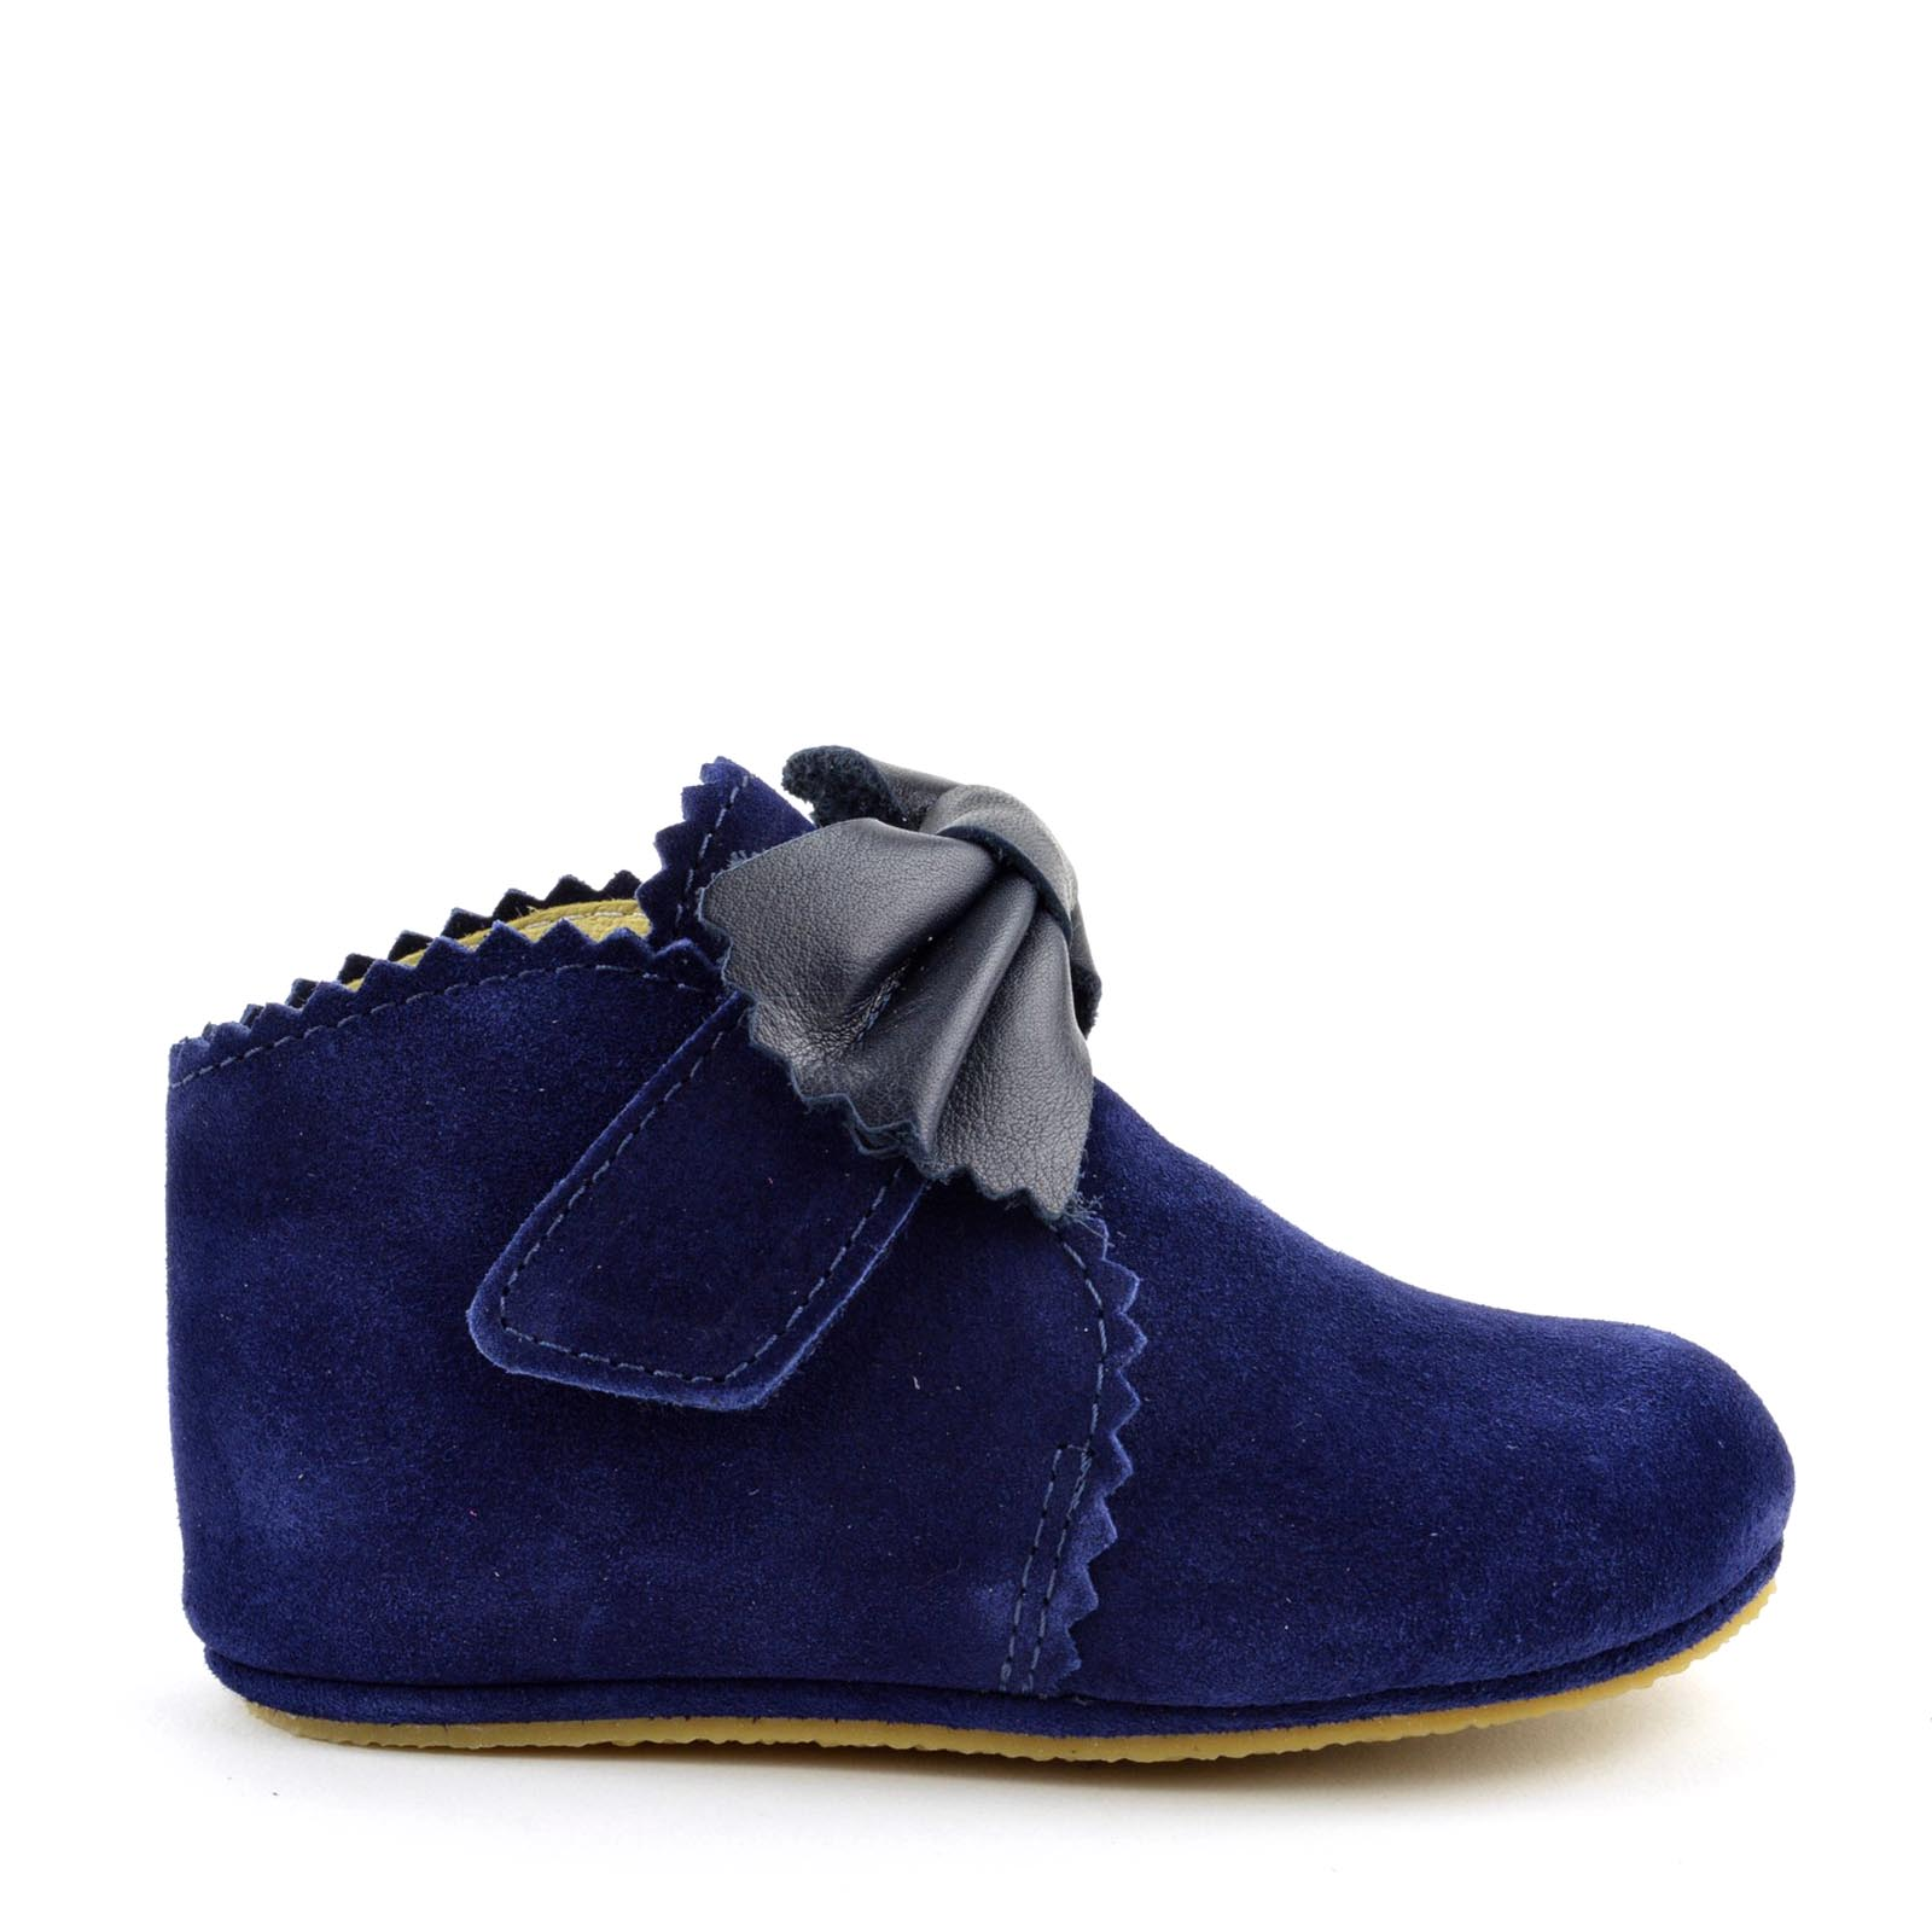 66fdb0eb4cc Pinocchio 1112 order online   Oxener Shoes